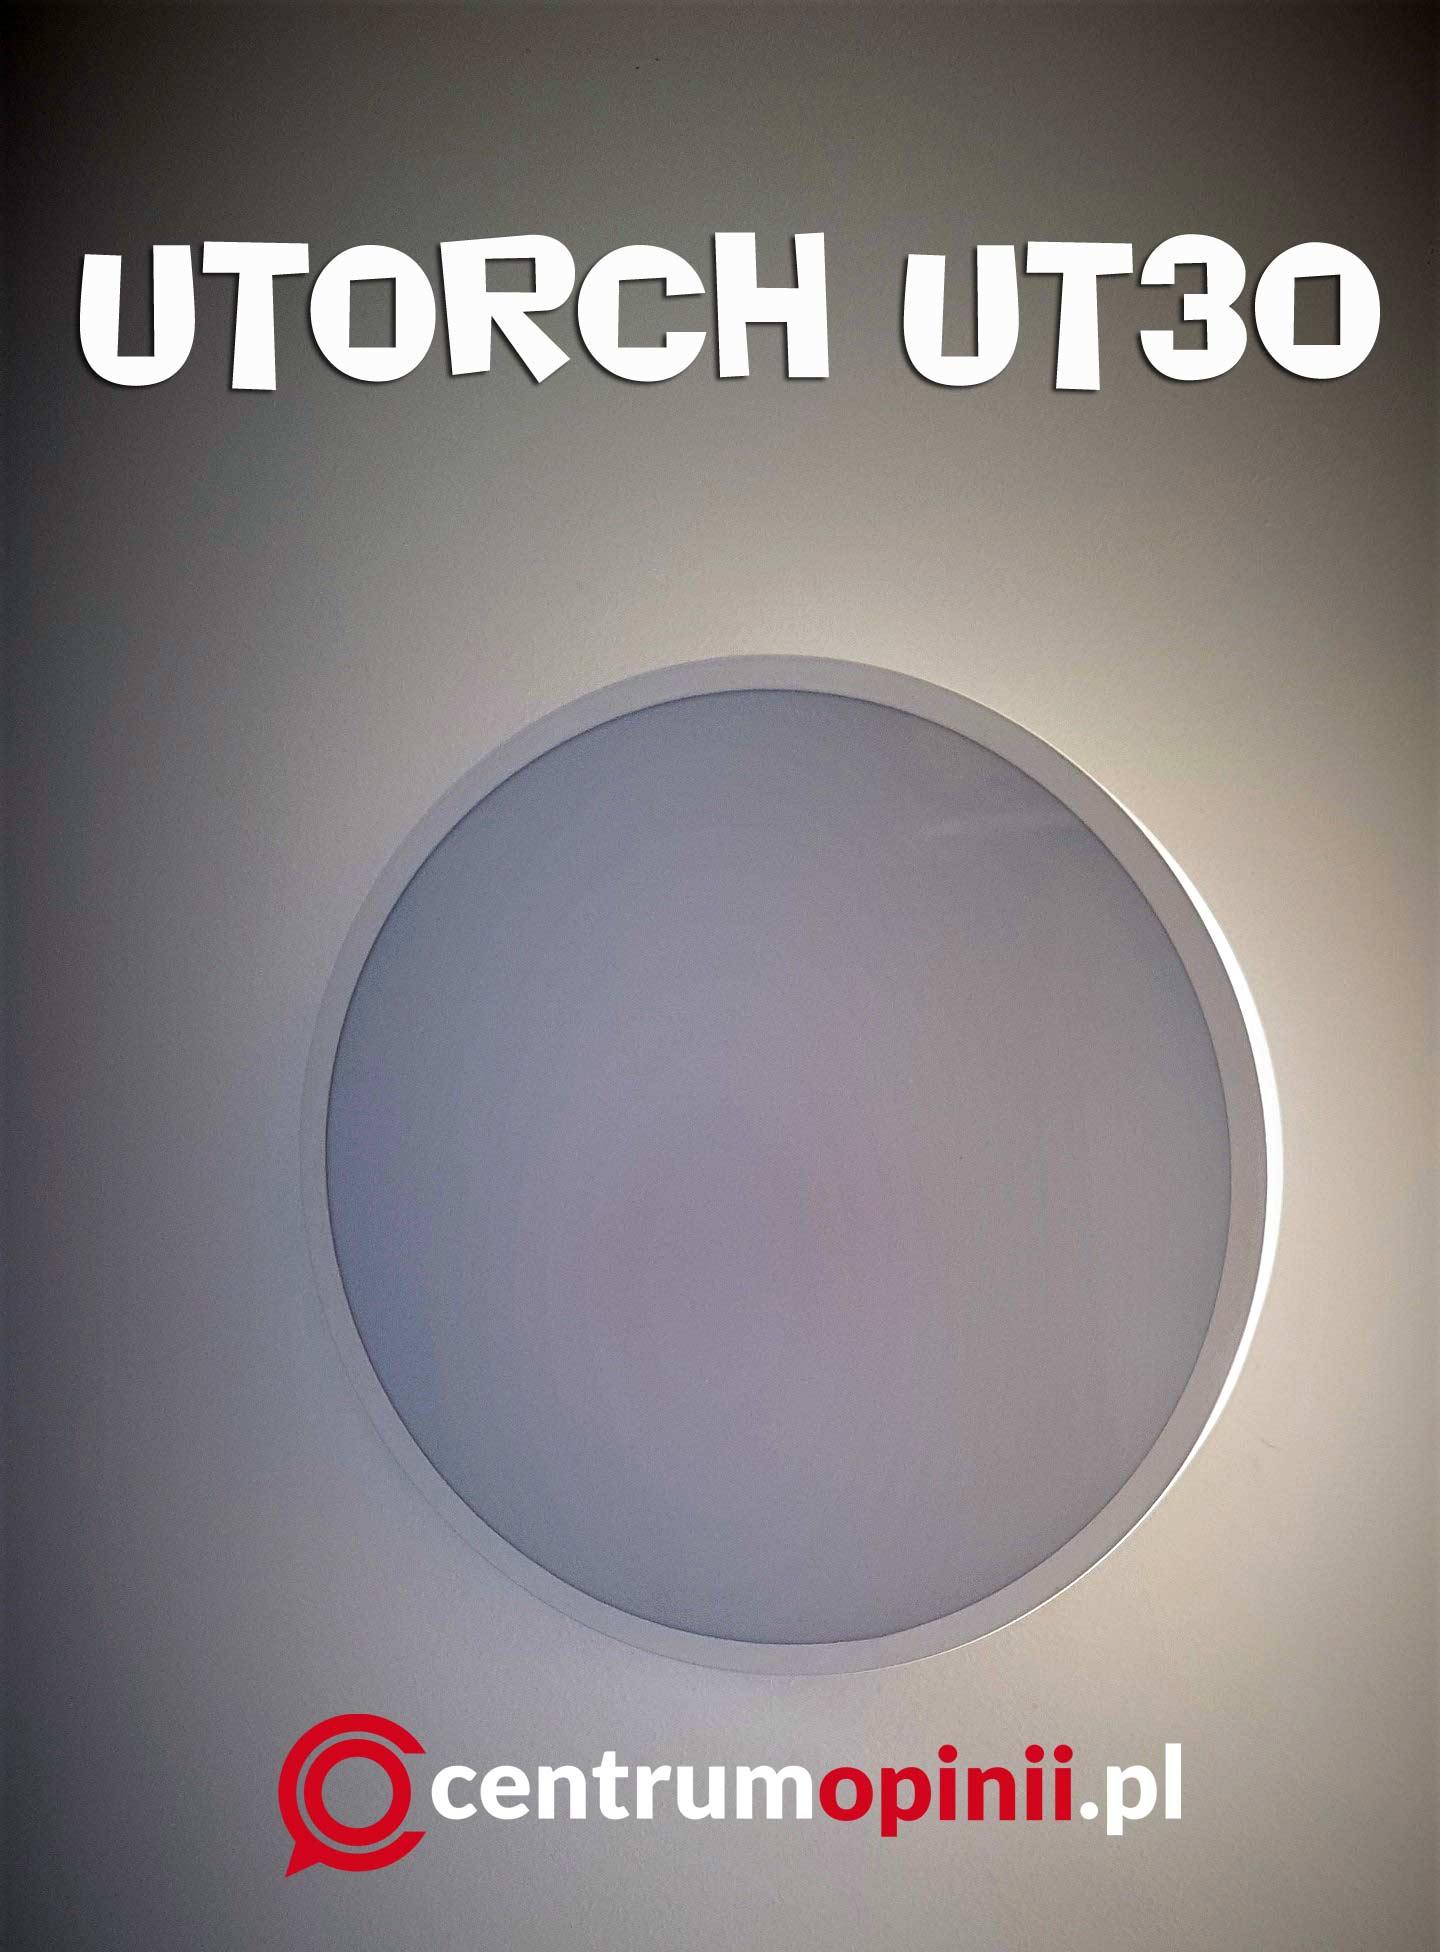 Utorch UT30 opinie test i recenzja